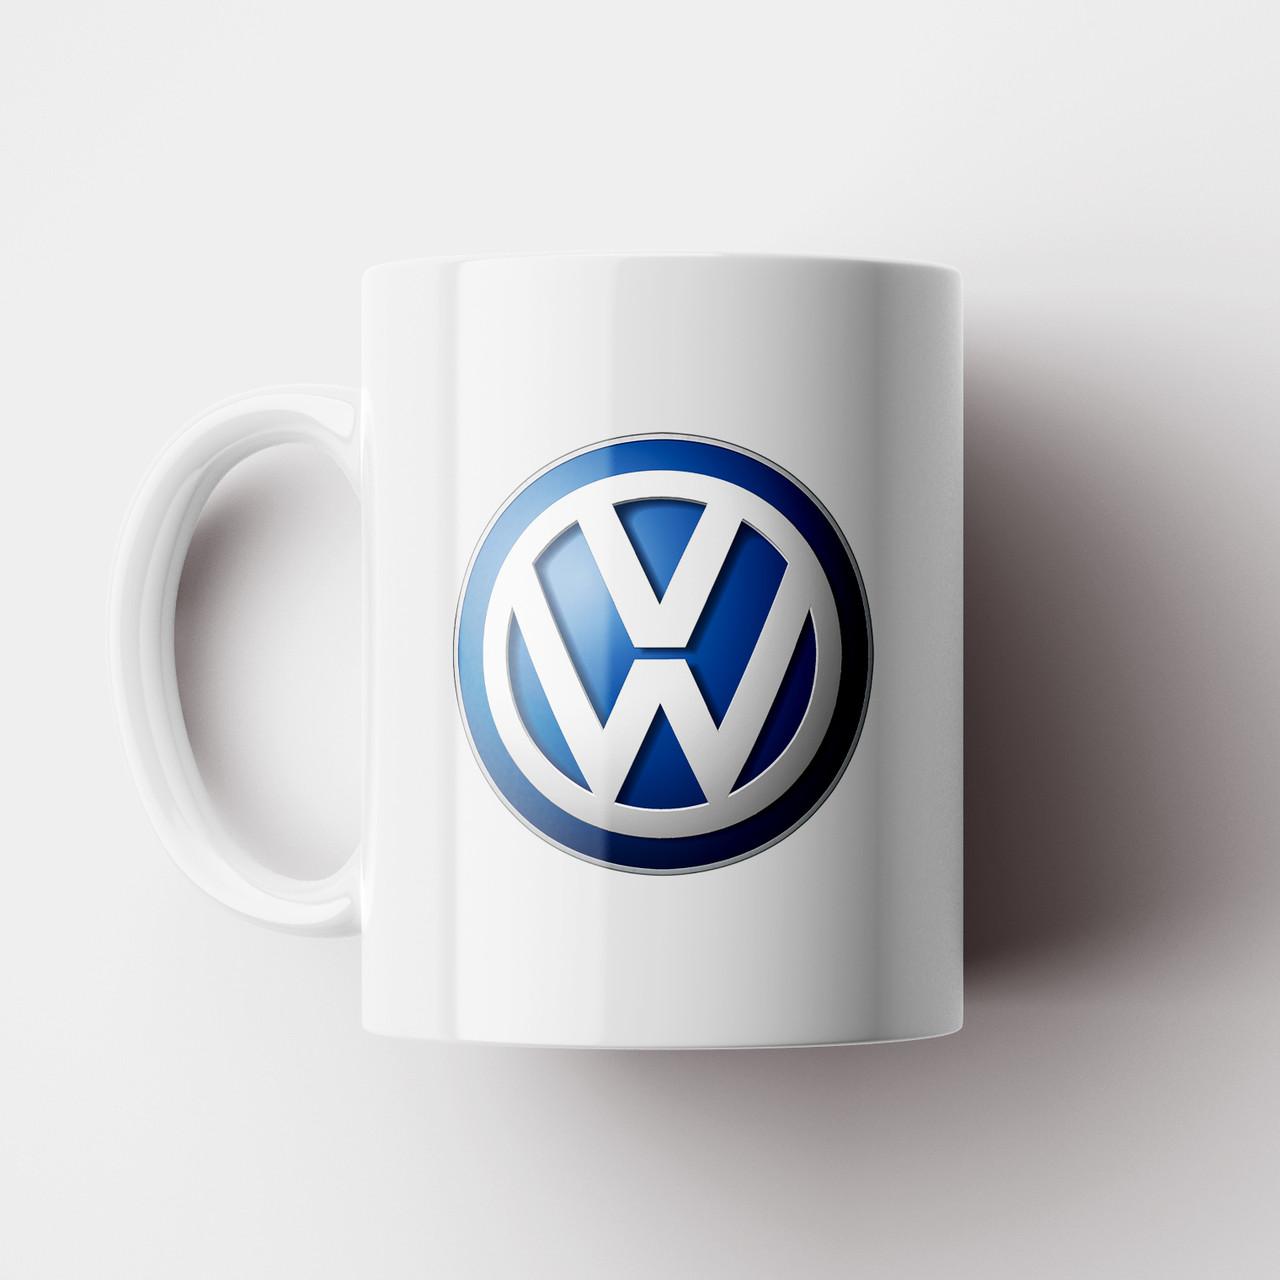 Чашка Volkswagen. Фольксваген